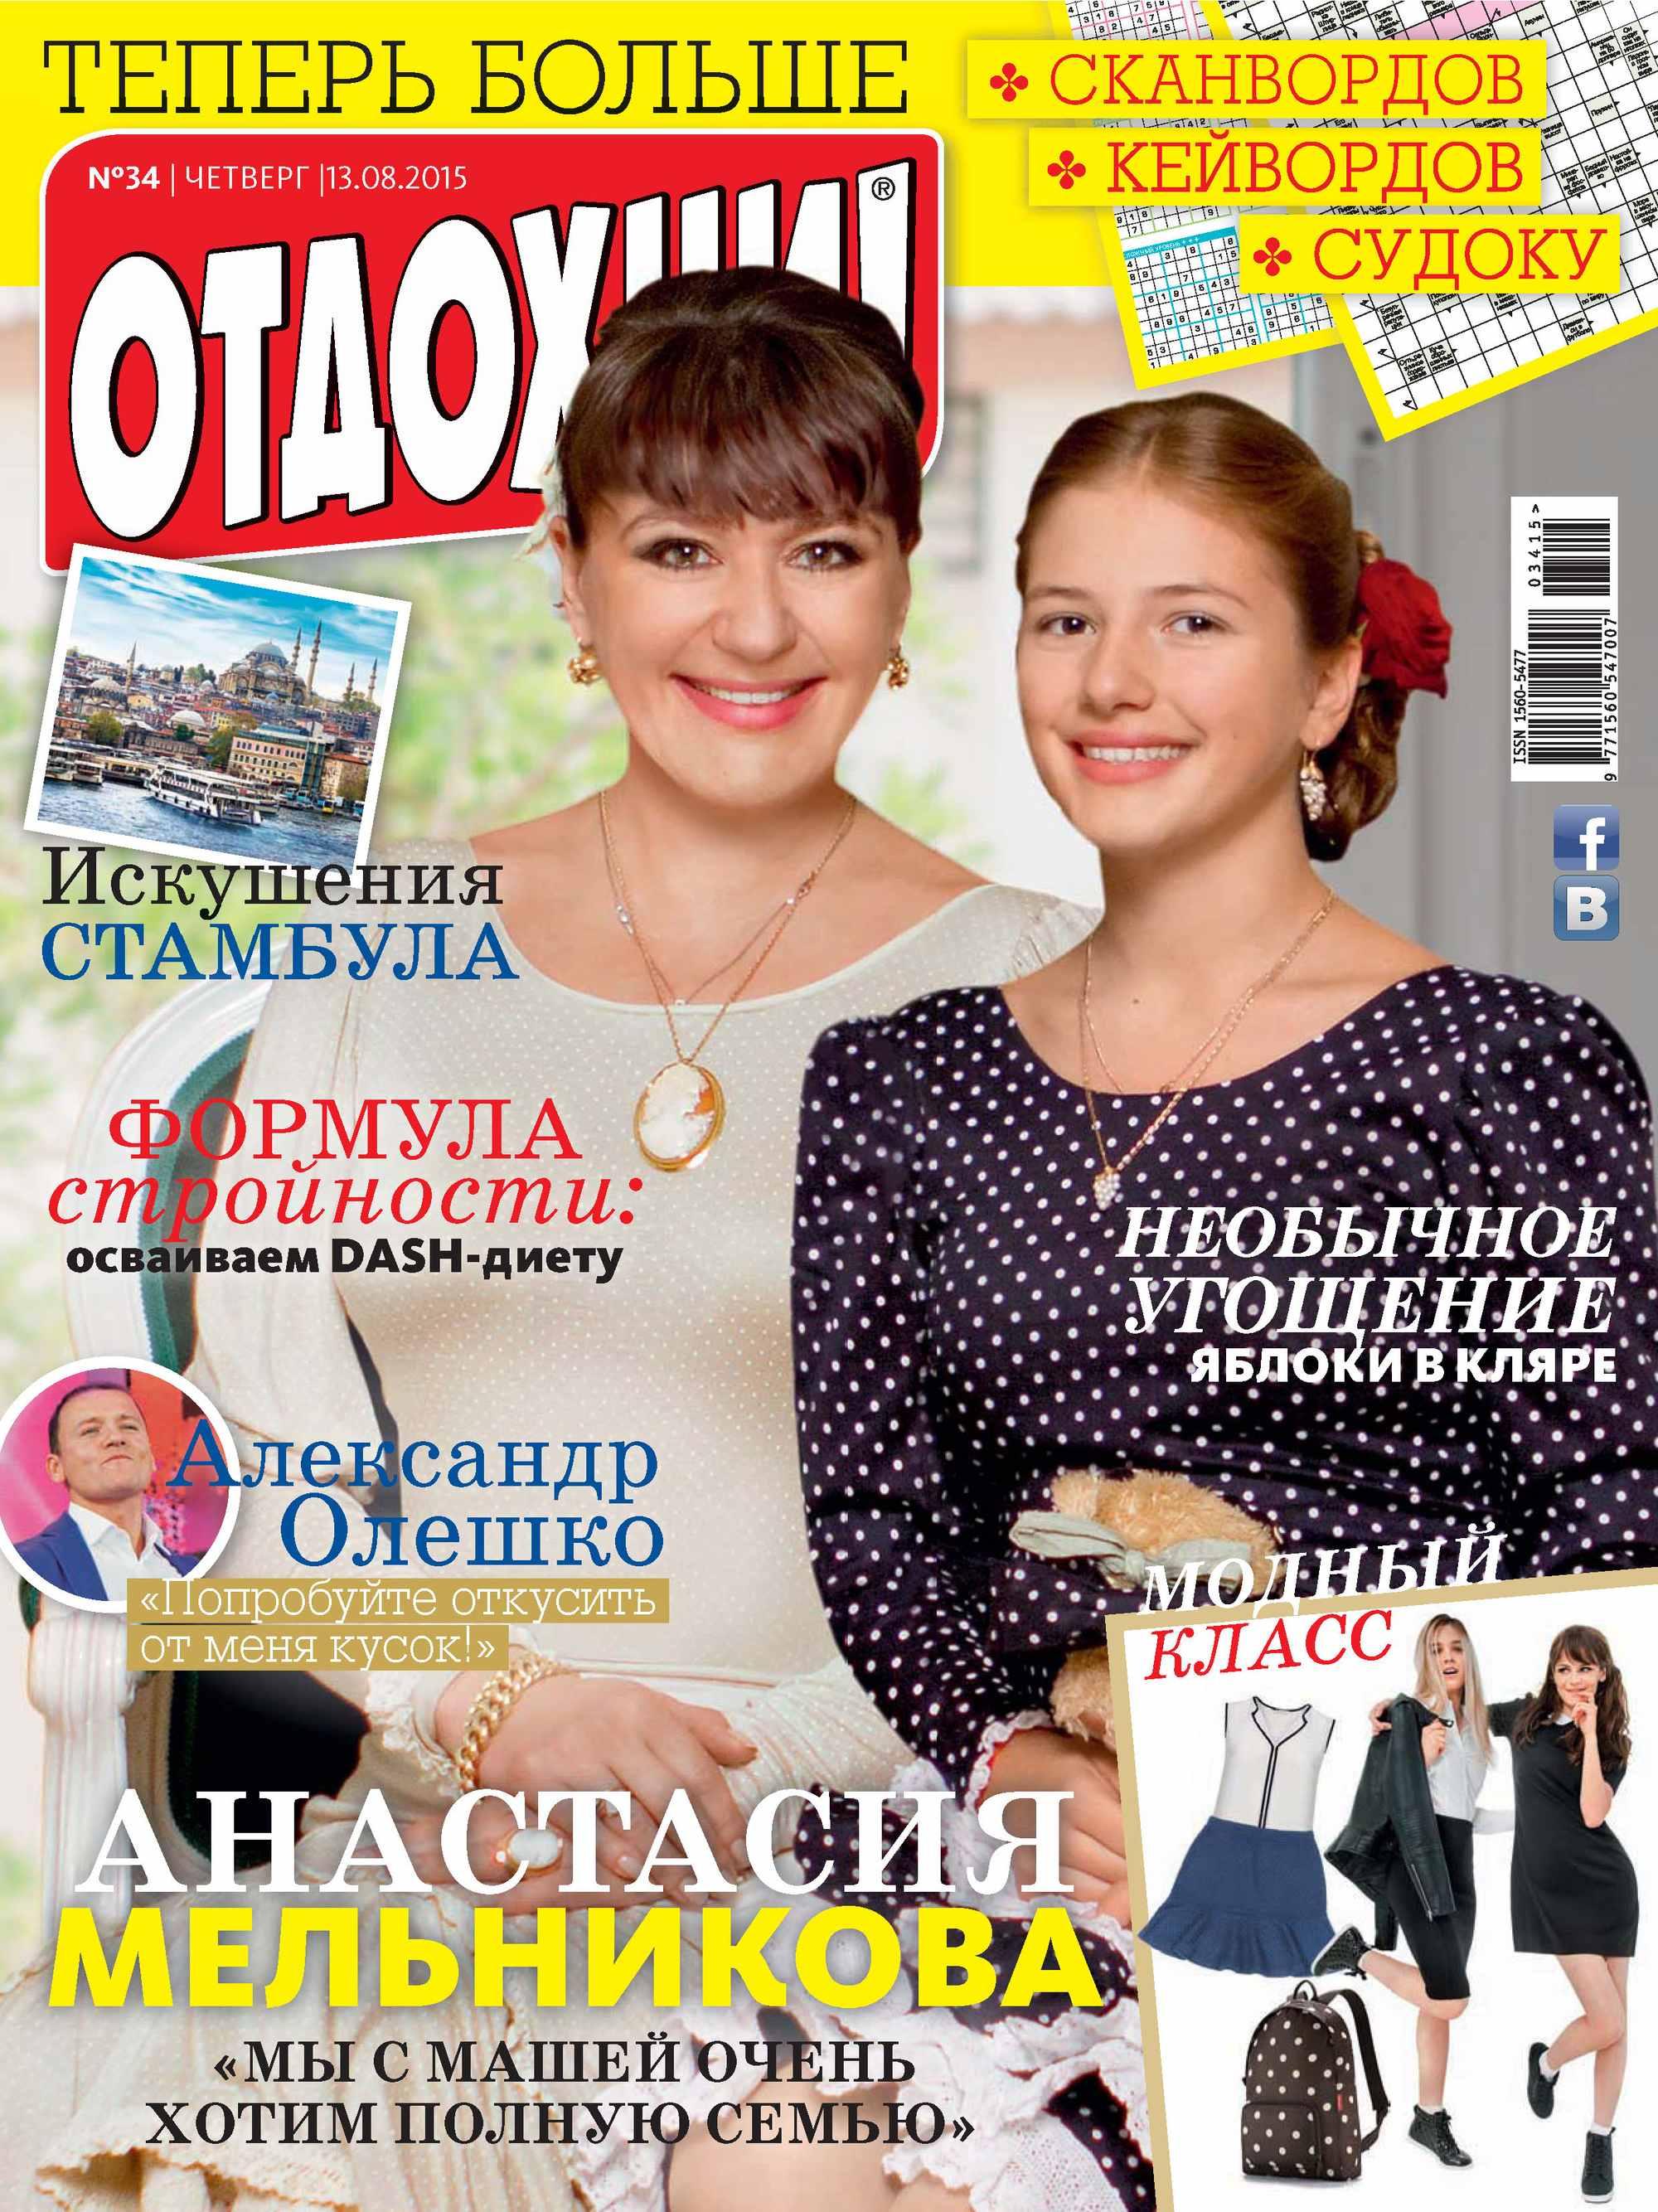 ИД «Бурда» Журнал «Отдохни!» №34/2015 ид бурда журнал отдохни 30 2015